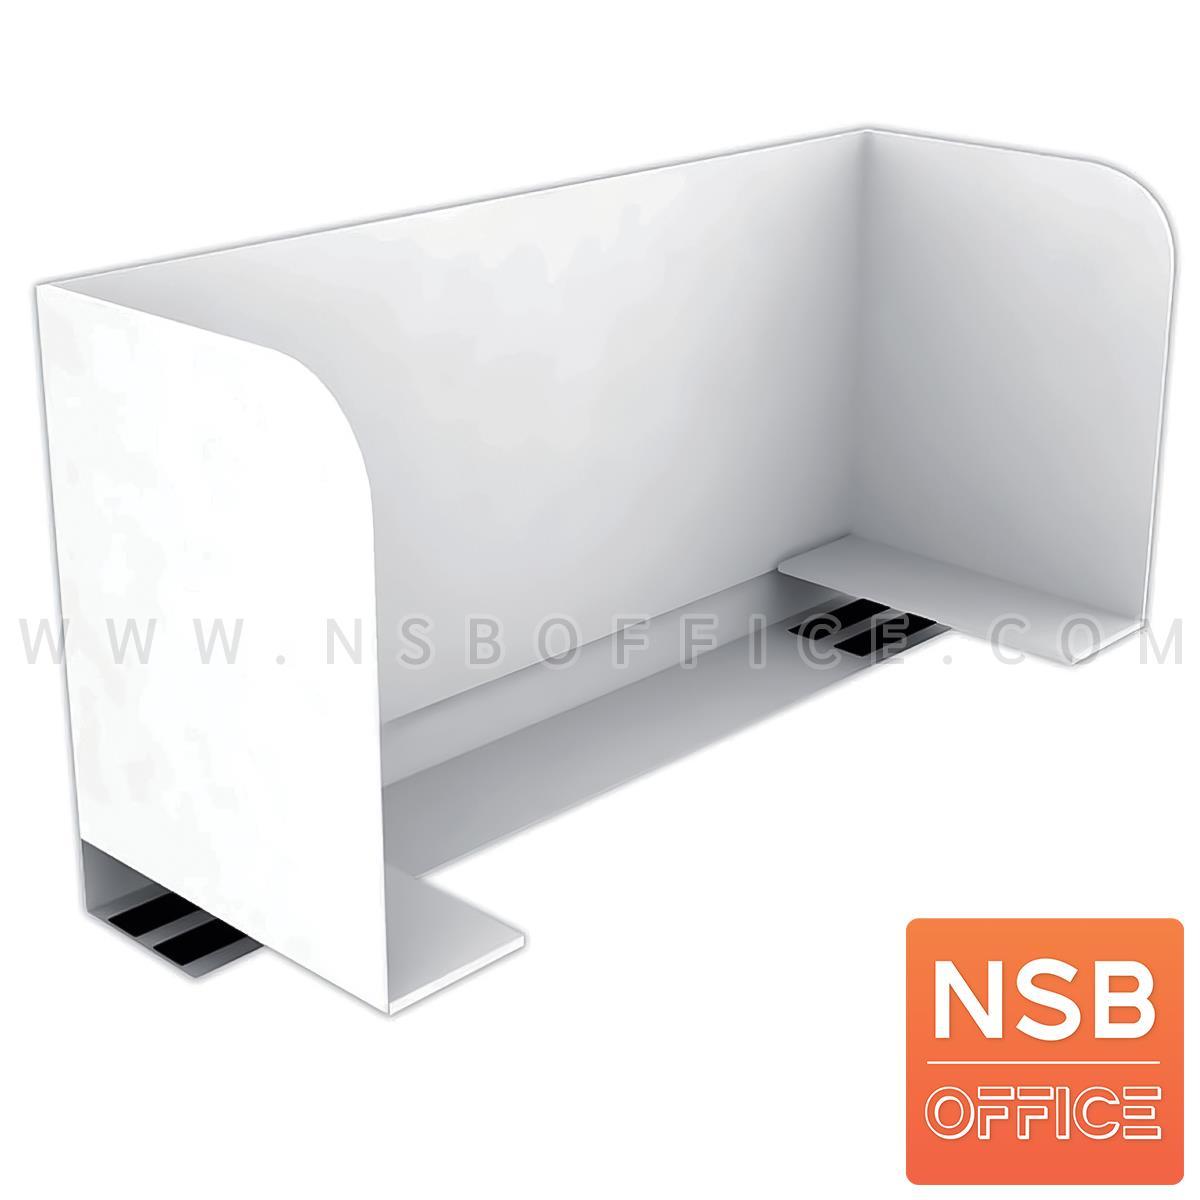 A23A004:มินิสกรีนคอกเหล็กสีขาว SM-50S กั้นหนังสือได้ 50W*20D*30H (ใช้วางหนีบสันโต๊ะ)